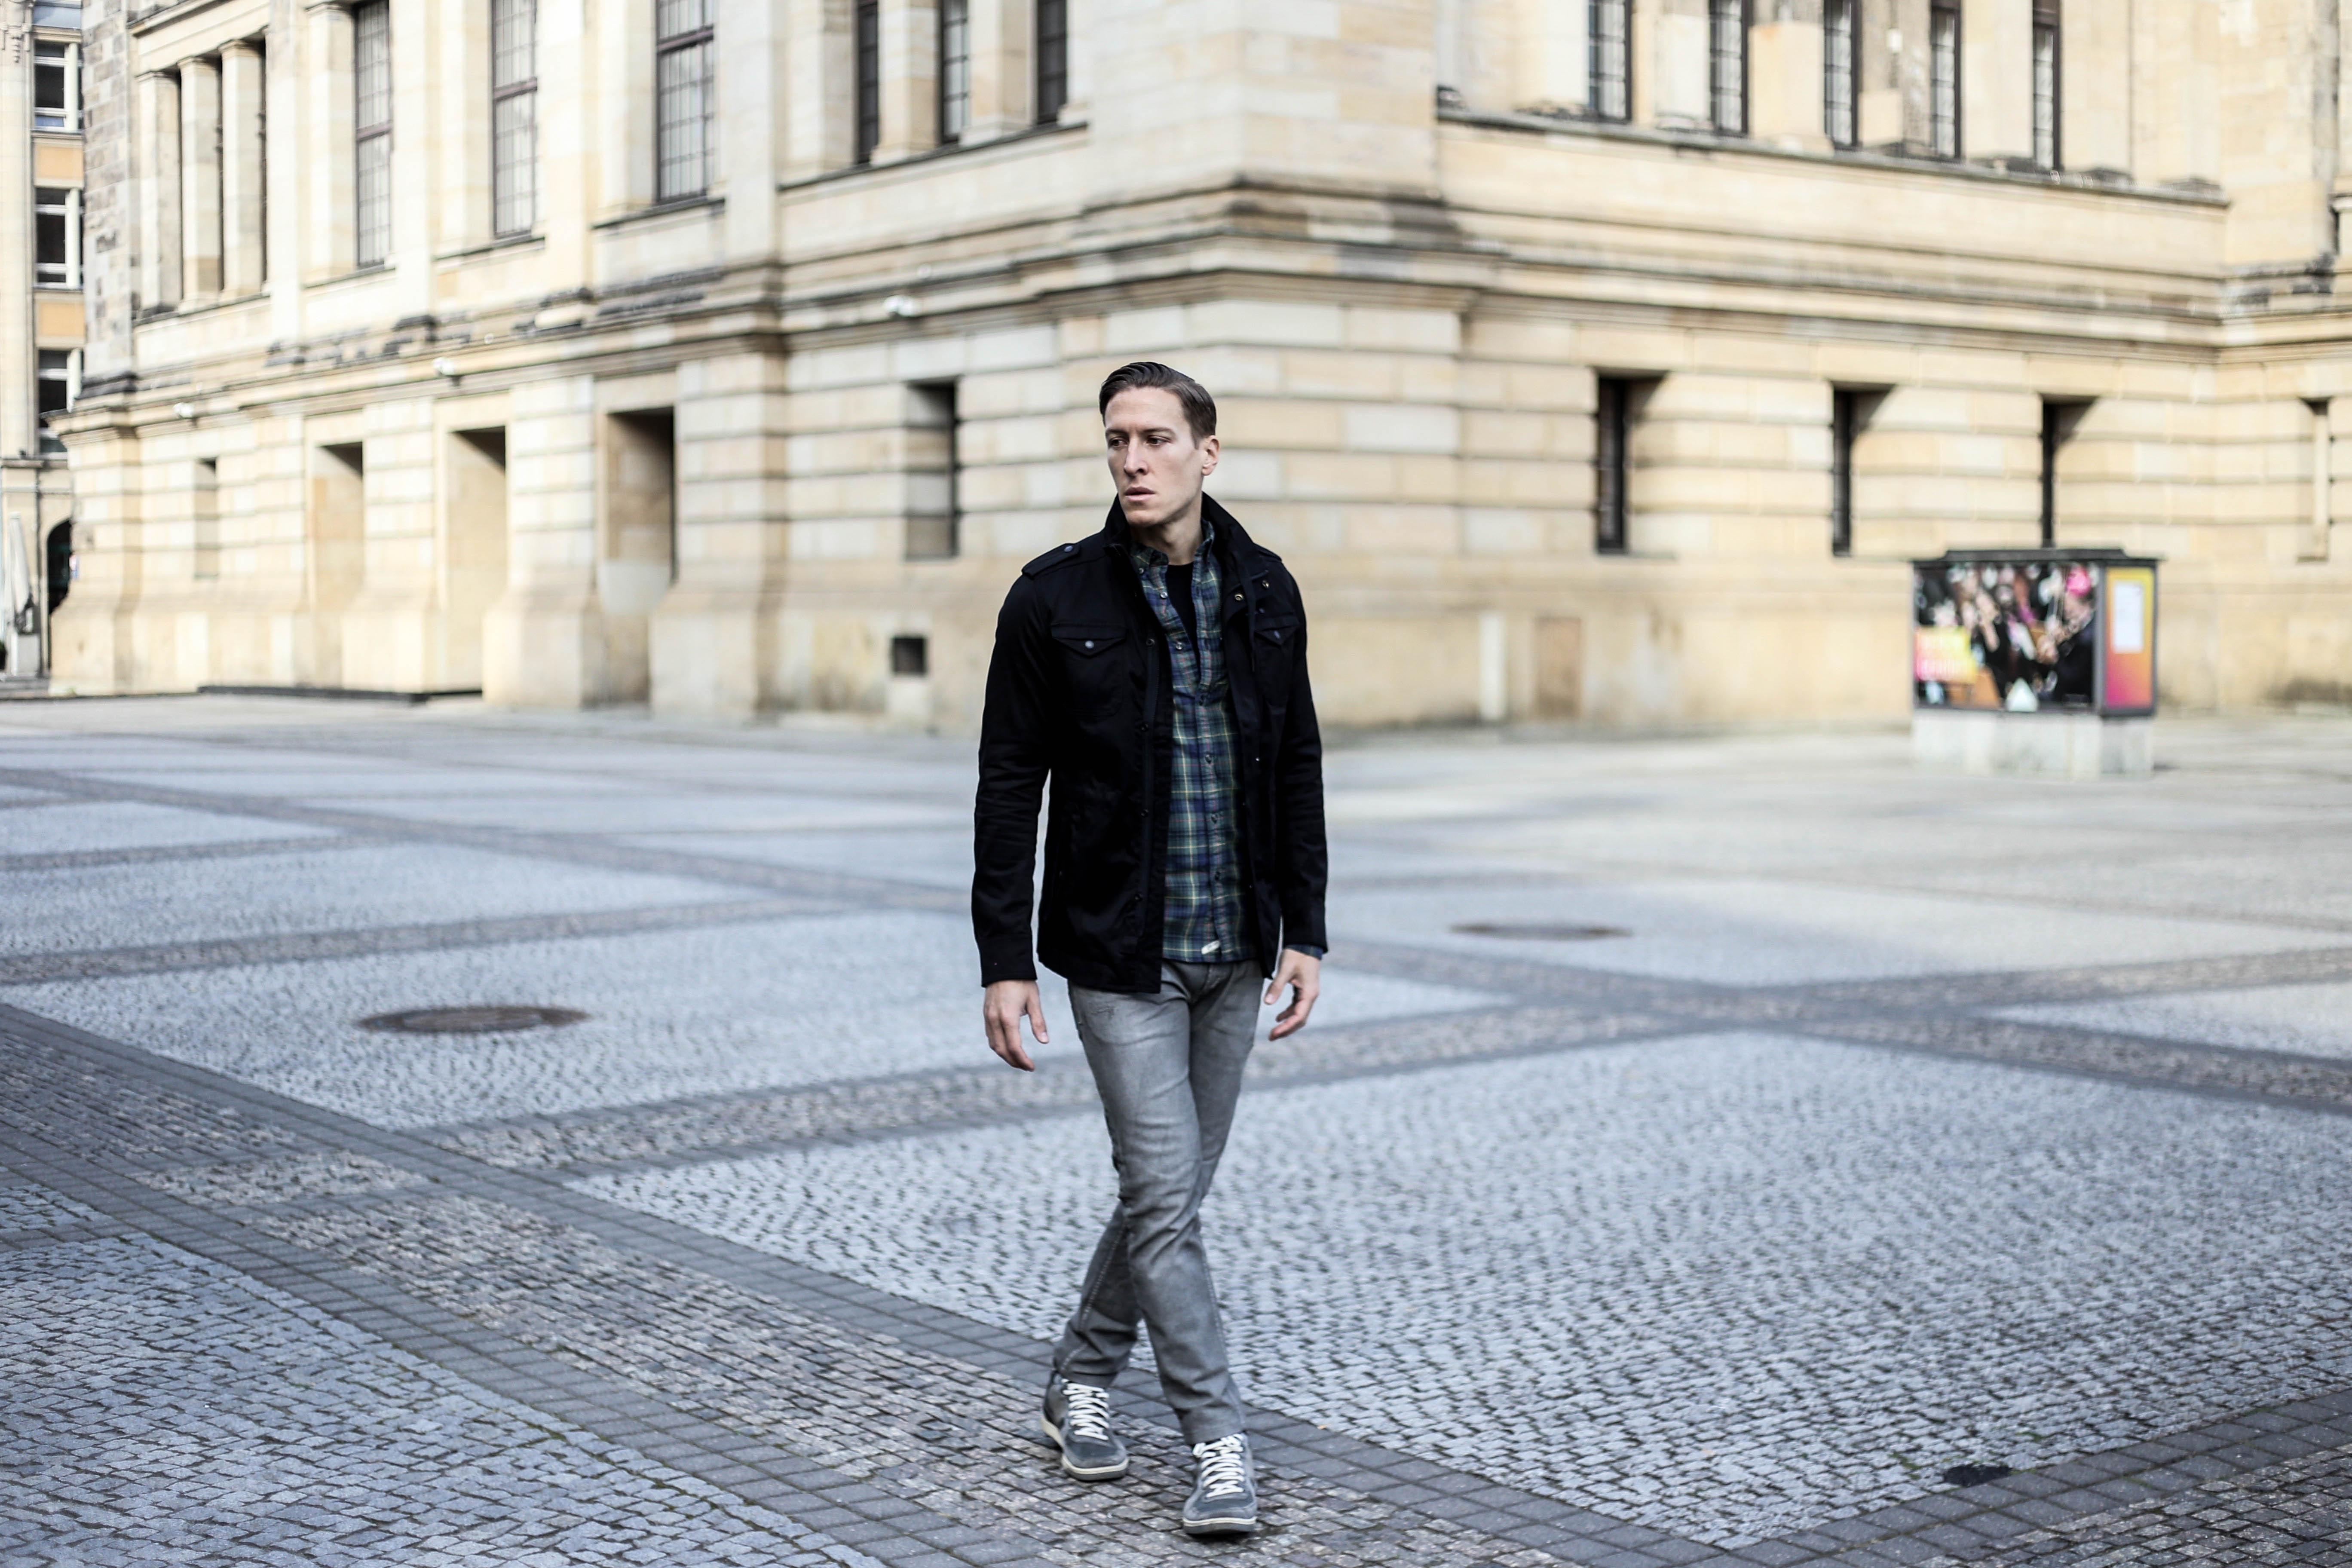 kariertes-hemd-maennerblog-fashionblog-berlin-outfit-graue-jeans_4106